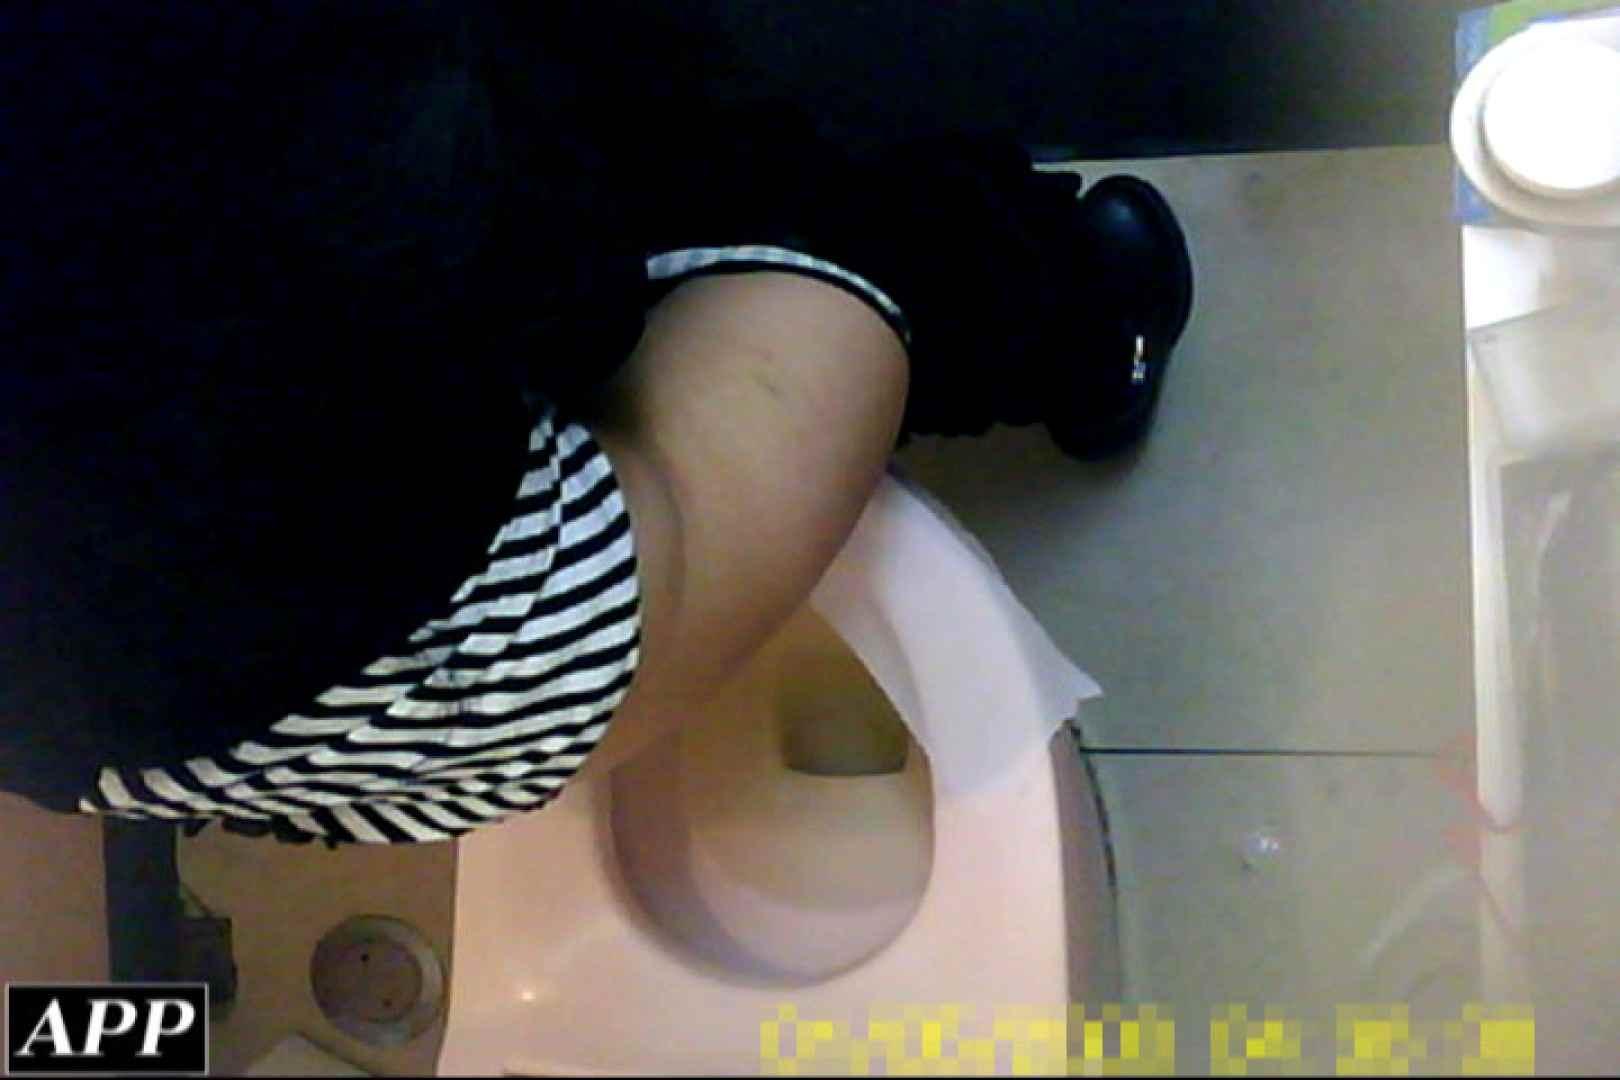 3視点洗面所 vol.092 洗面所 | OLセックス  101画像 21